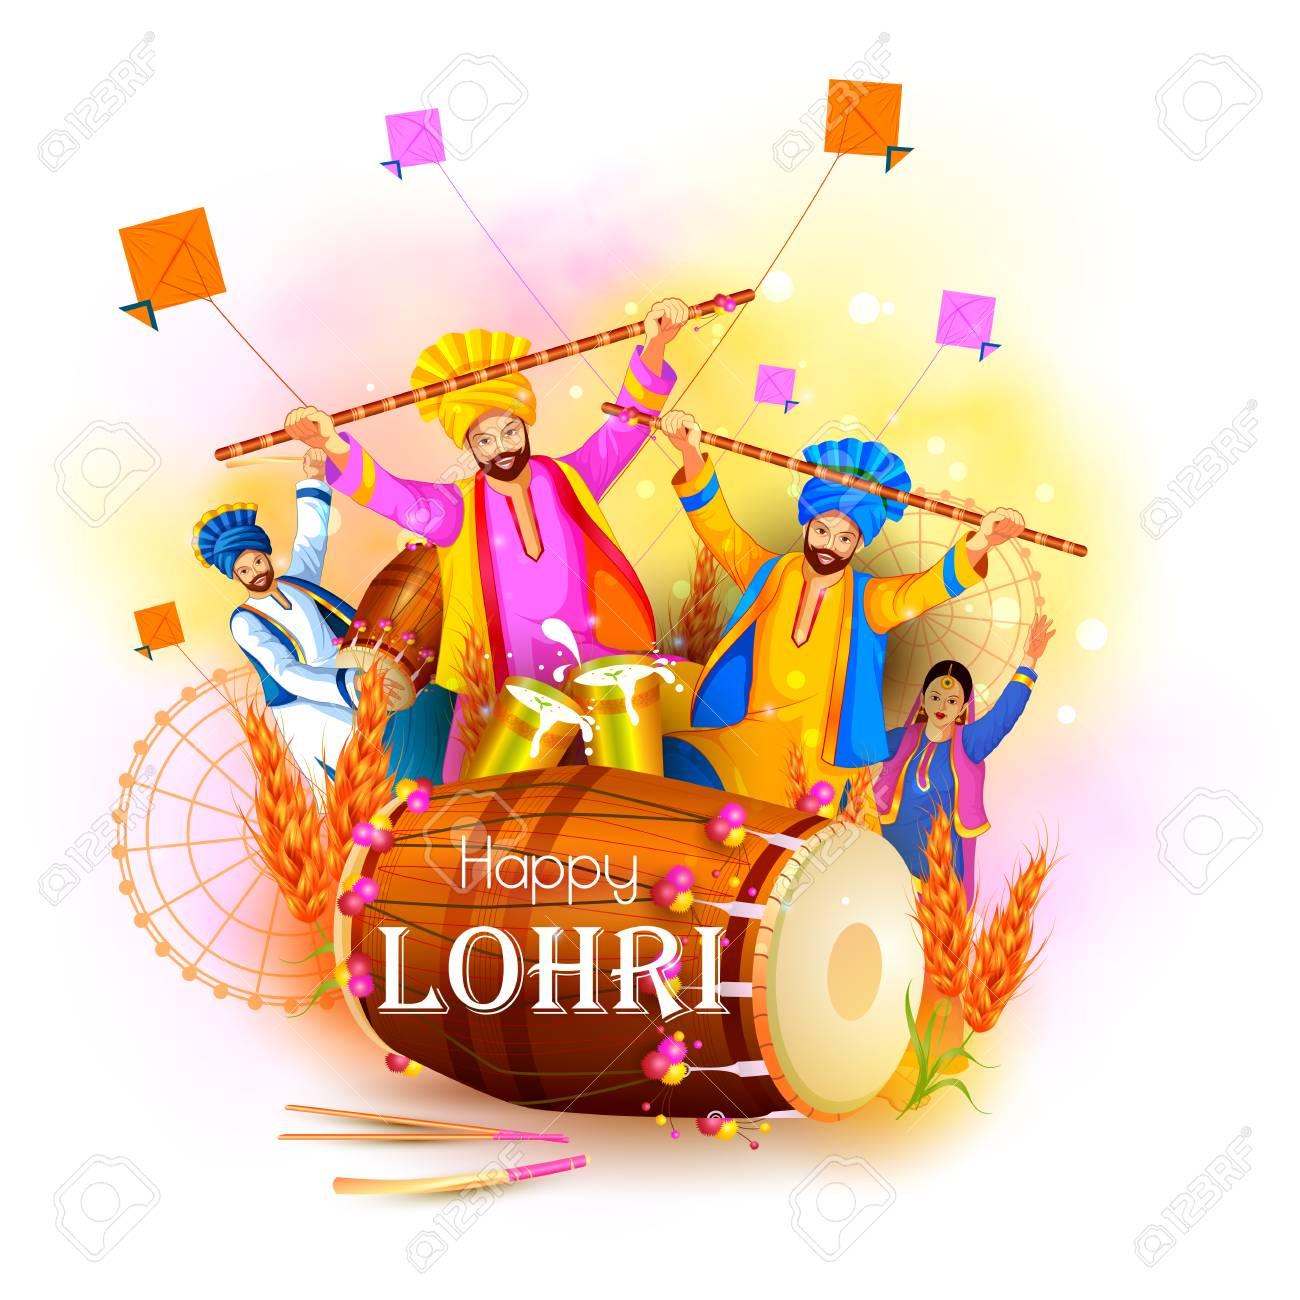 Happy Lohri holiday festival of Punjab India Vector illustration. - 90824889